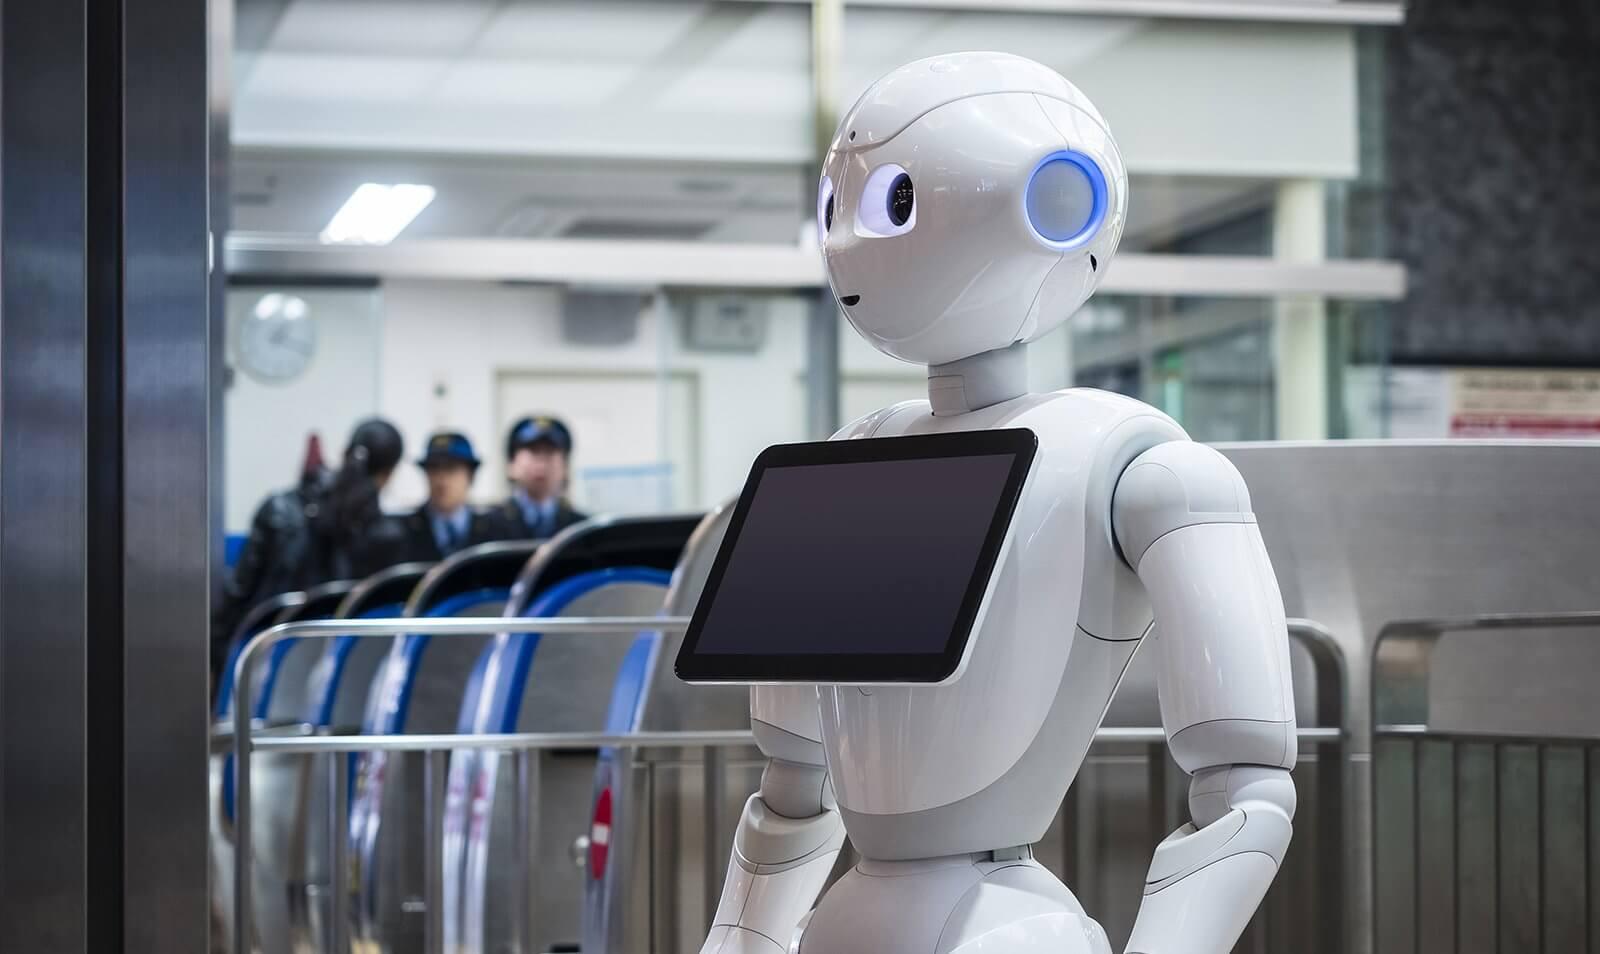 AI Powered Robots - Pepper - Tech Mahindra